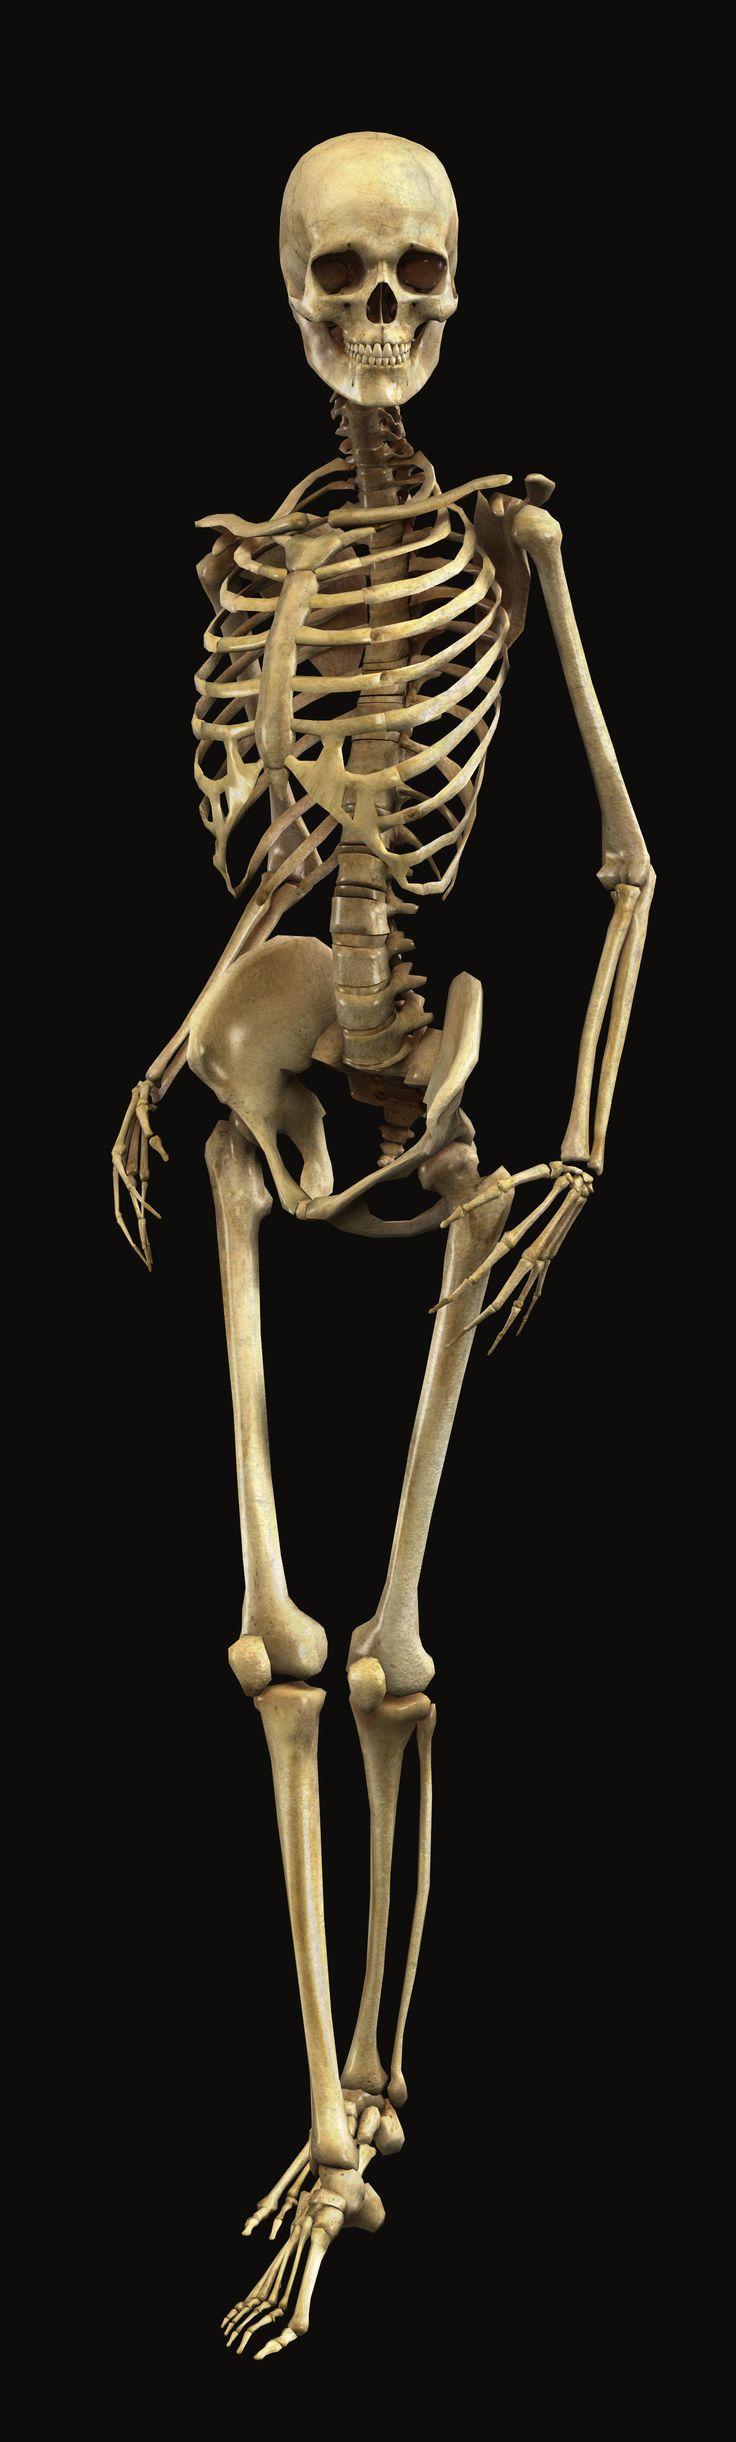 Images of Skeleton   736x2442